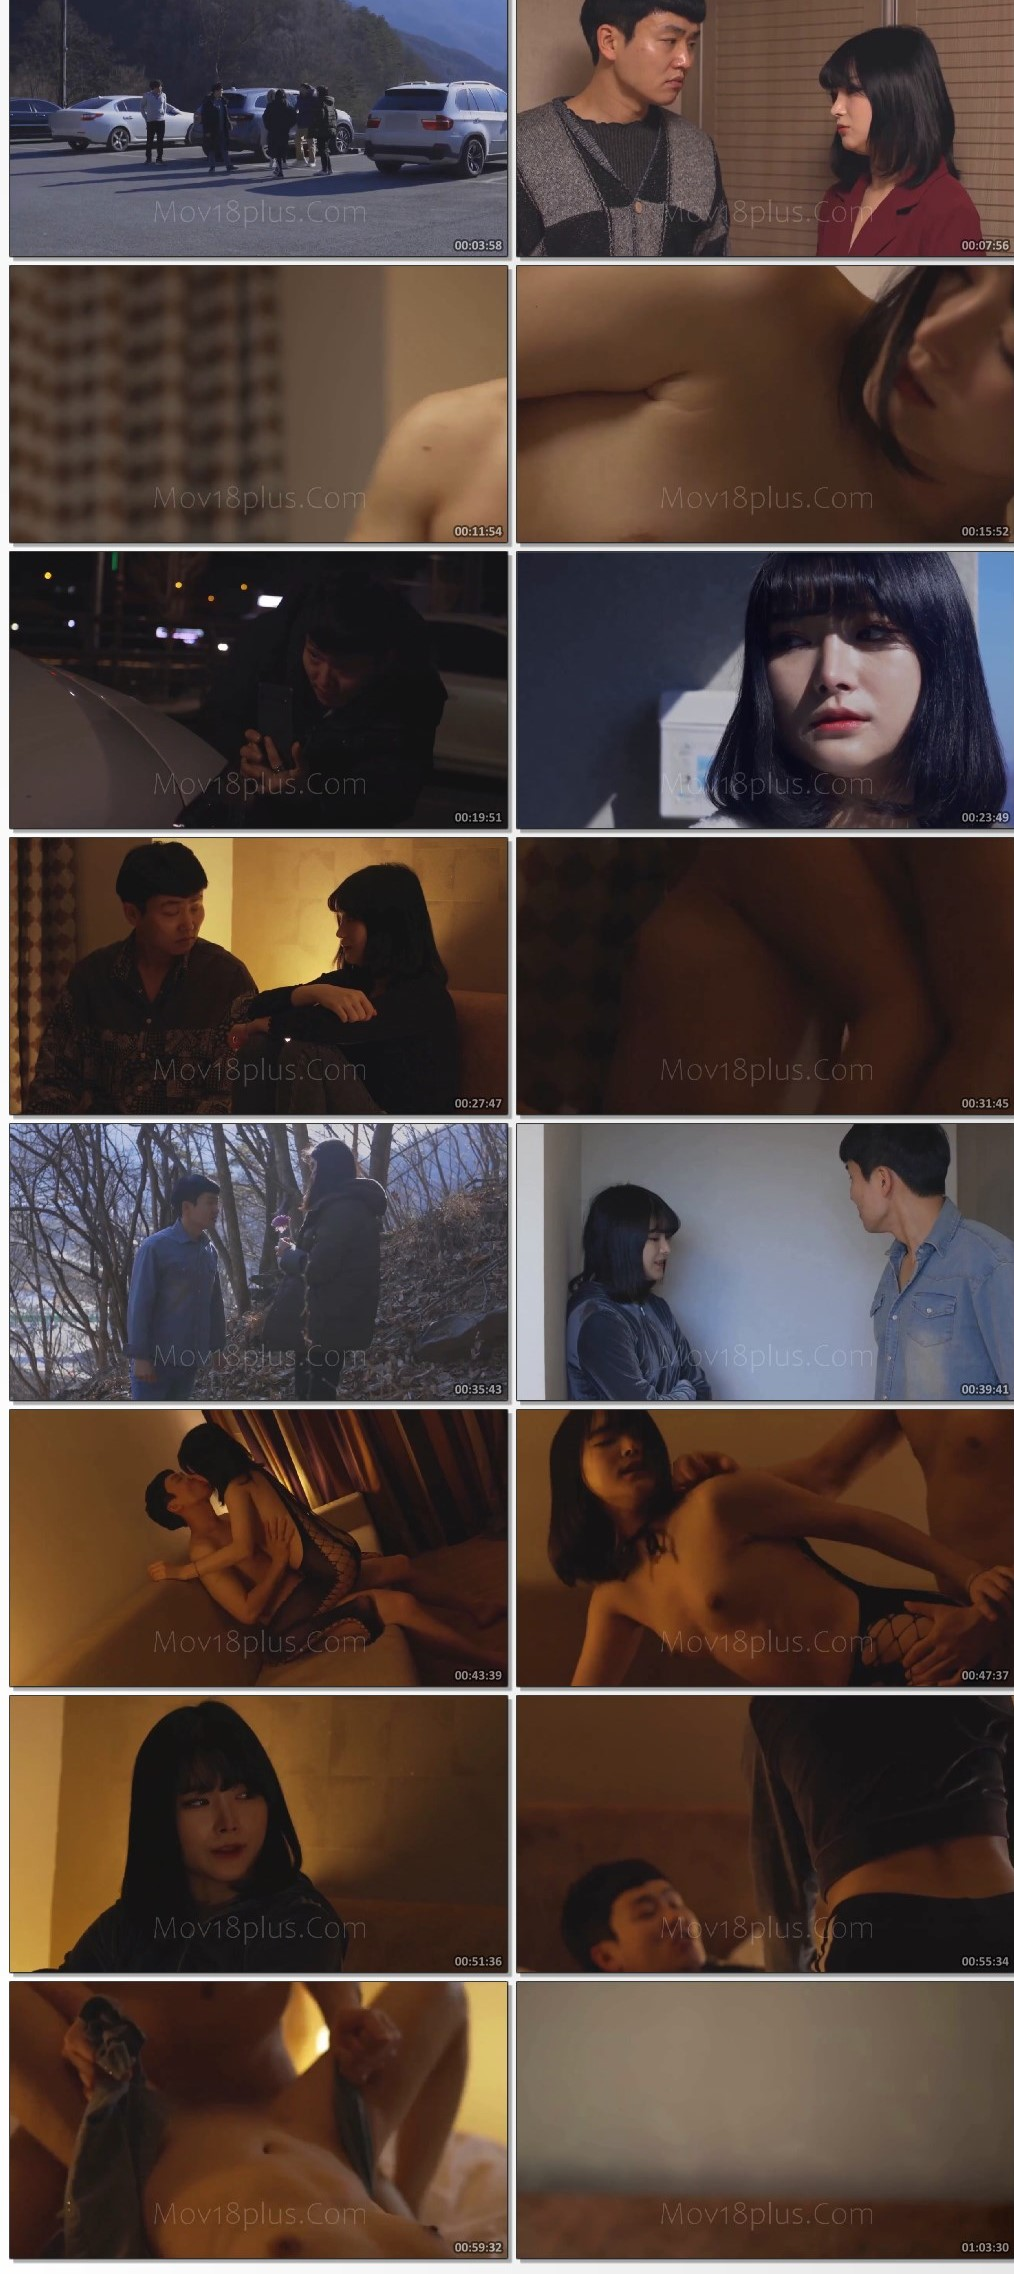 The-Key-to-the-Keyhole-2021-www-filmguro-site-Korean-Movie-720p-HDRip-550-MB-mkv-thumbs